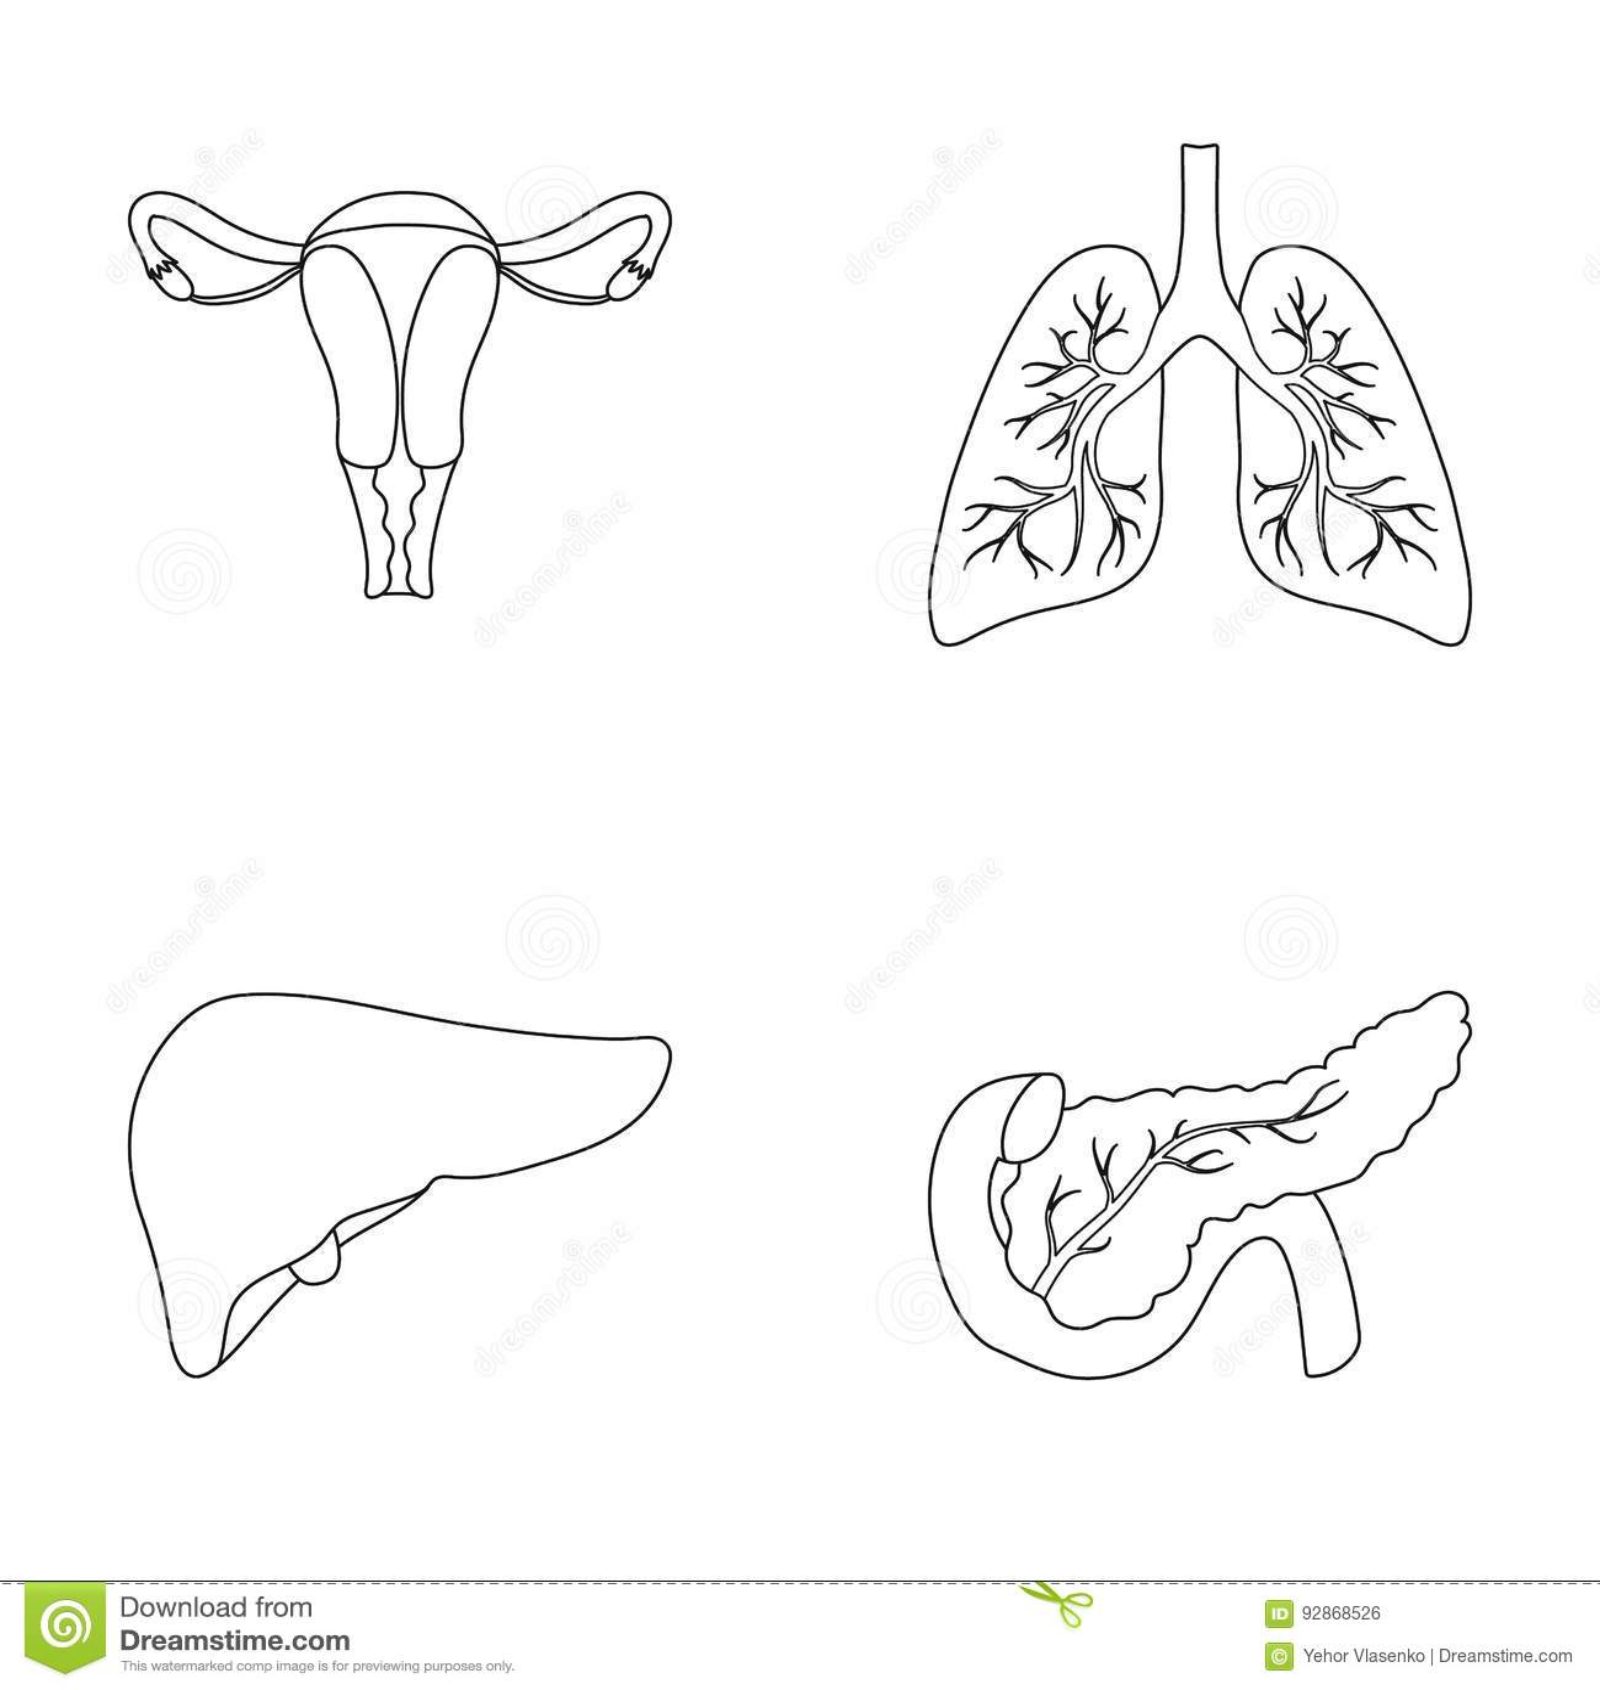 Liver Pancreas Gallbladder Duodenum And Bile Pa Cartoon